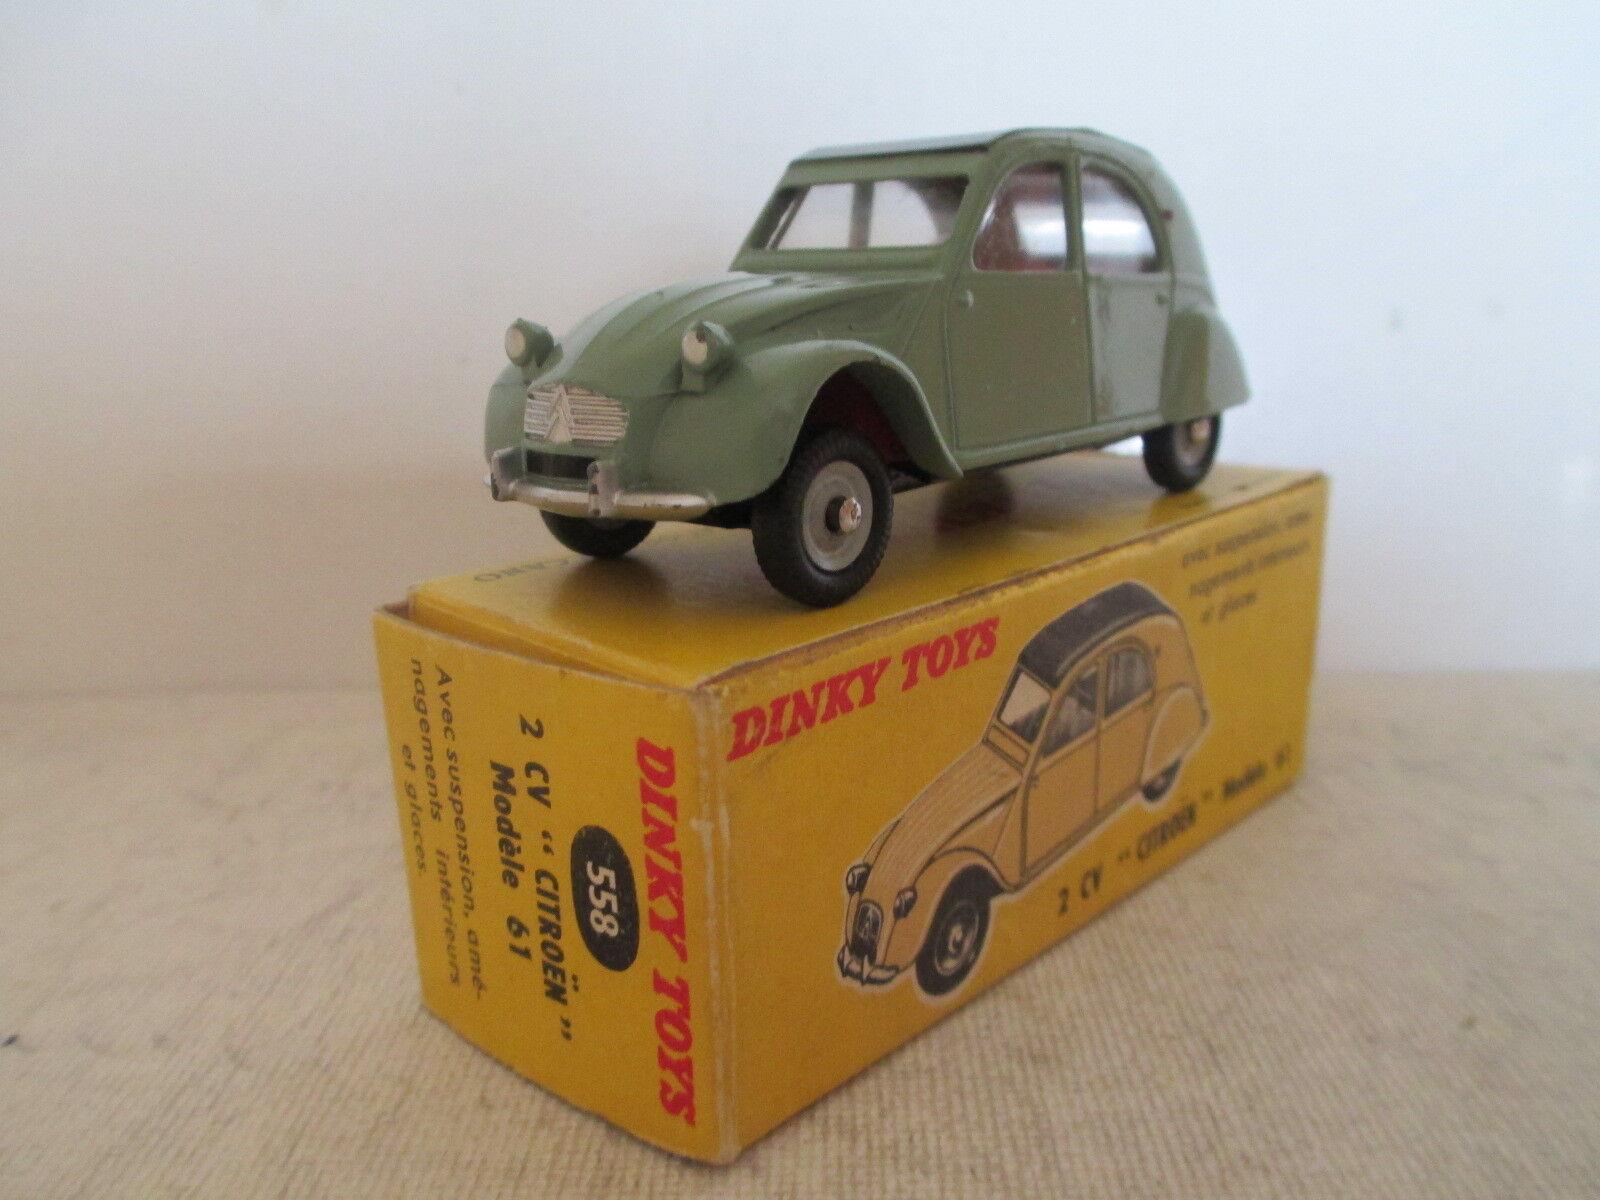 French dinky toys 558 citroen 2cv 1960 62 mib 9 in box very nice l @ @ k